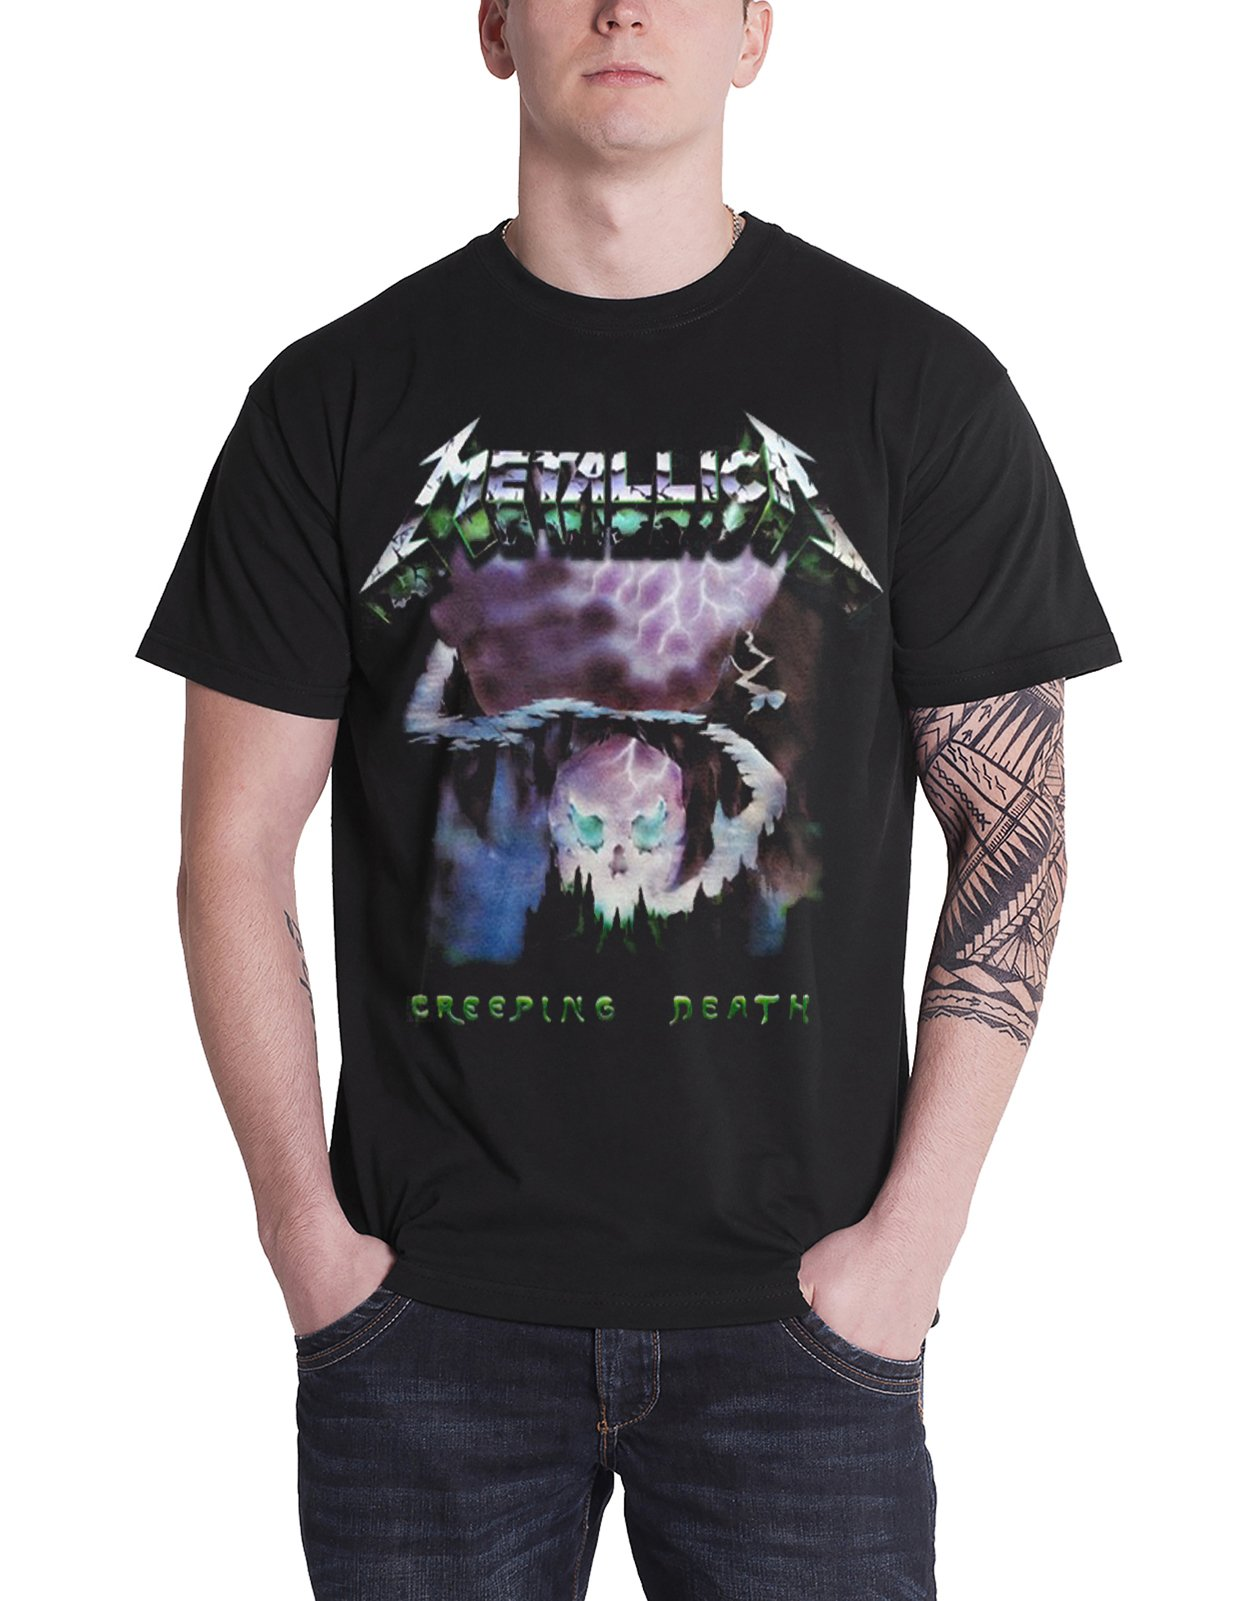 Metallica T Shirt Creeping Death Song Ride The Lightning Official Mens Black